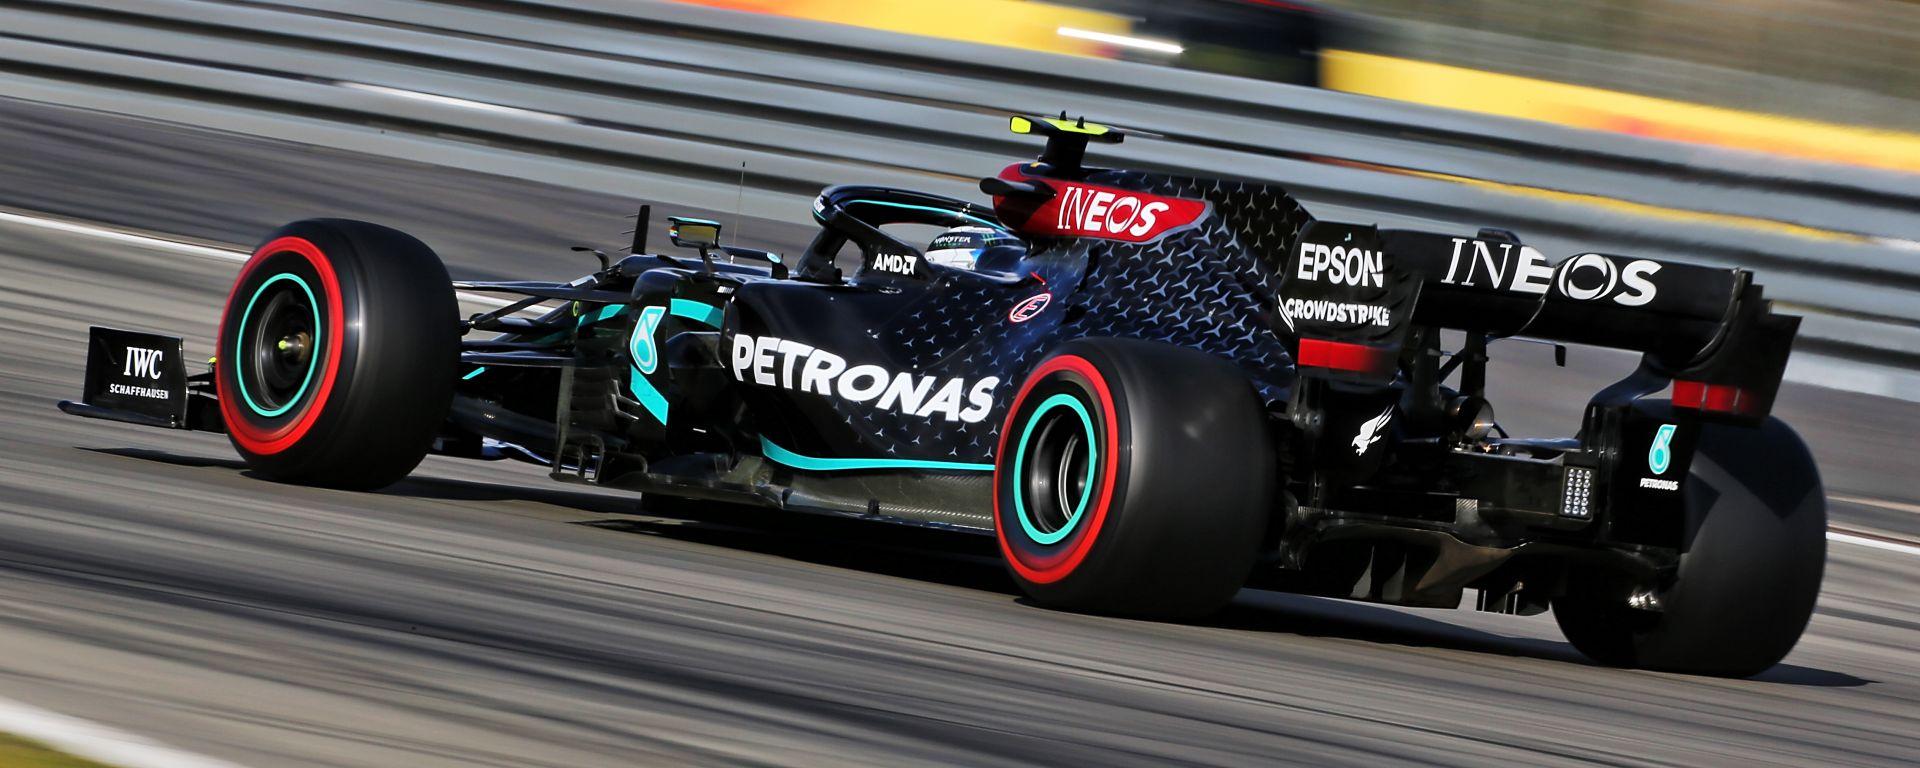 GP Eifel 2020, Nurburgring: Valtteri Bottas (Mercedes AMG F1)